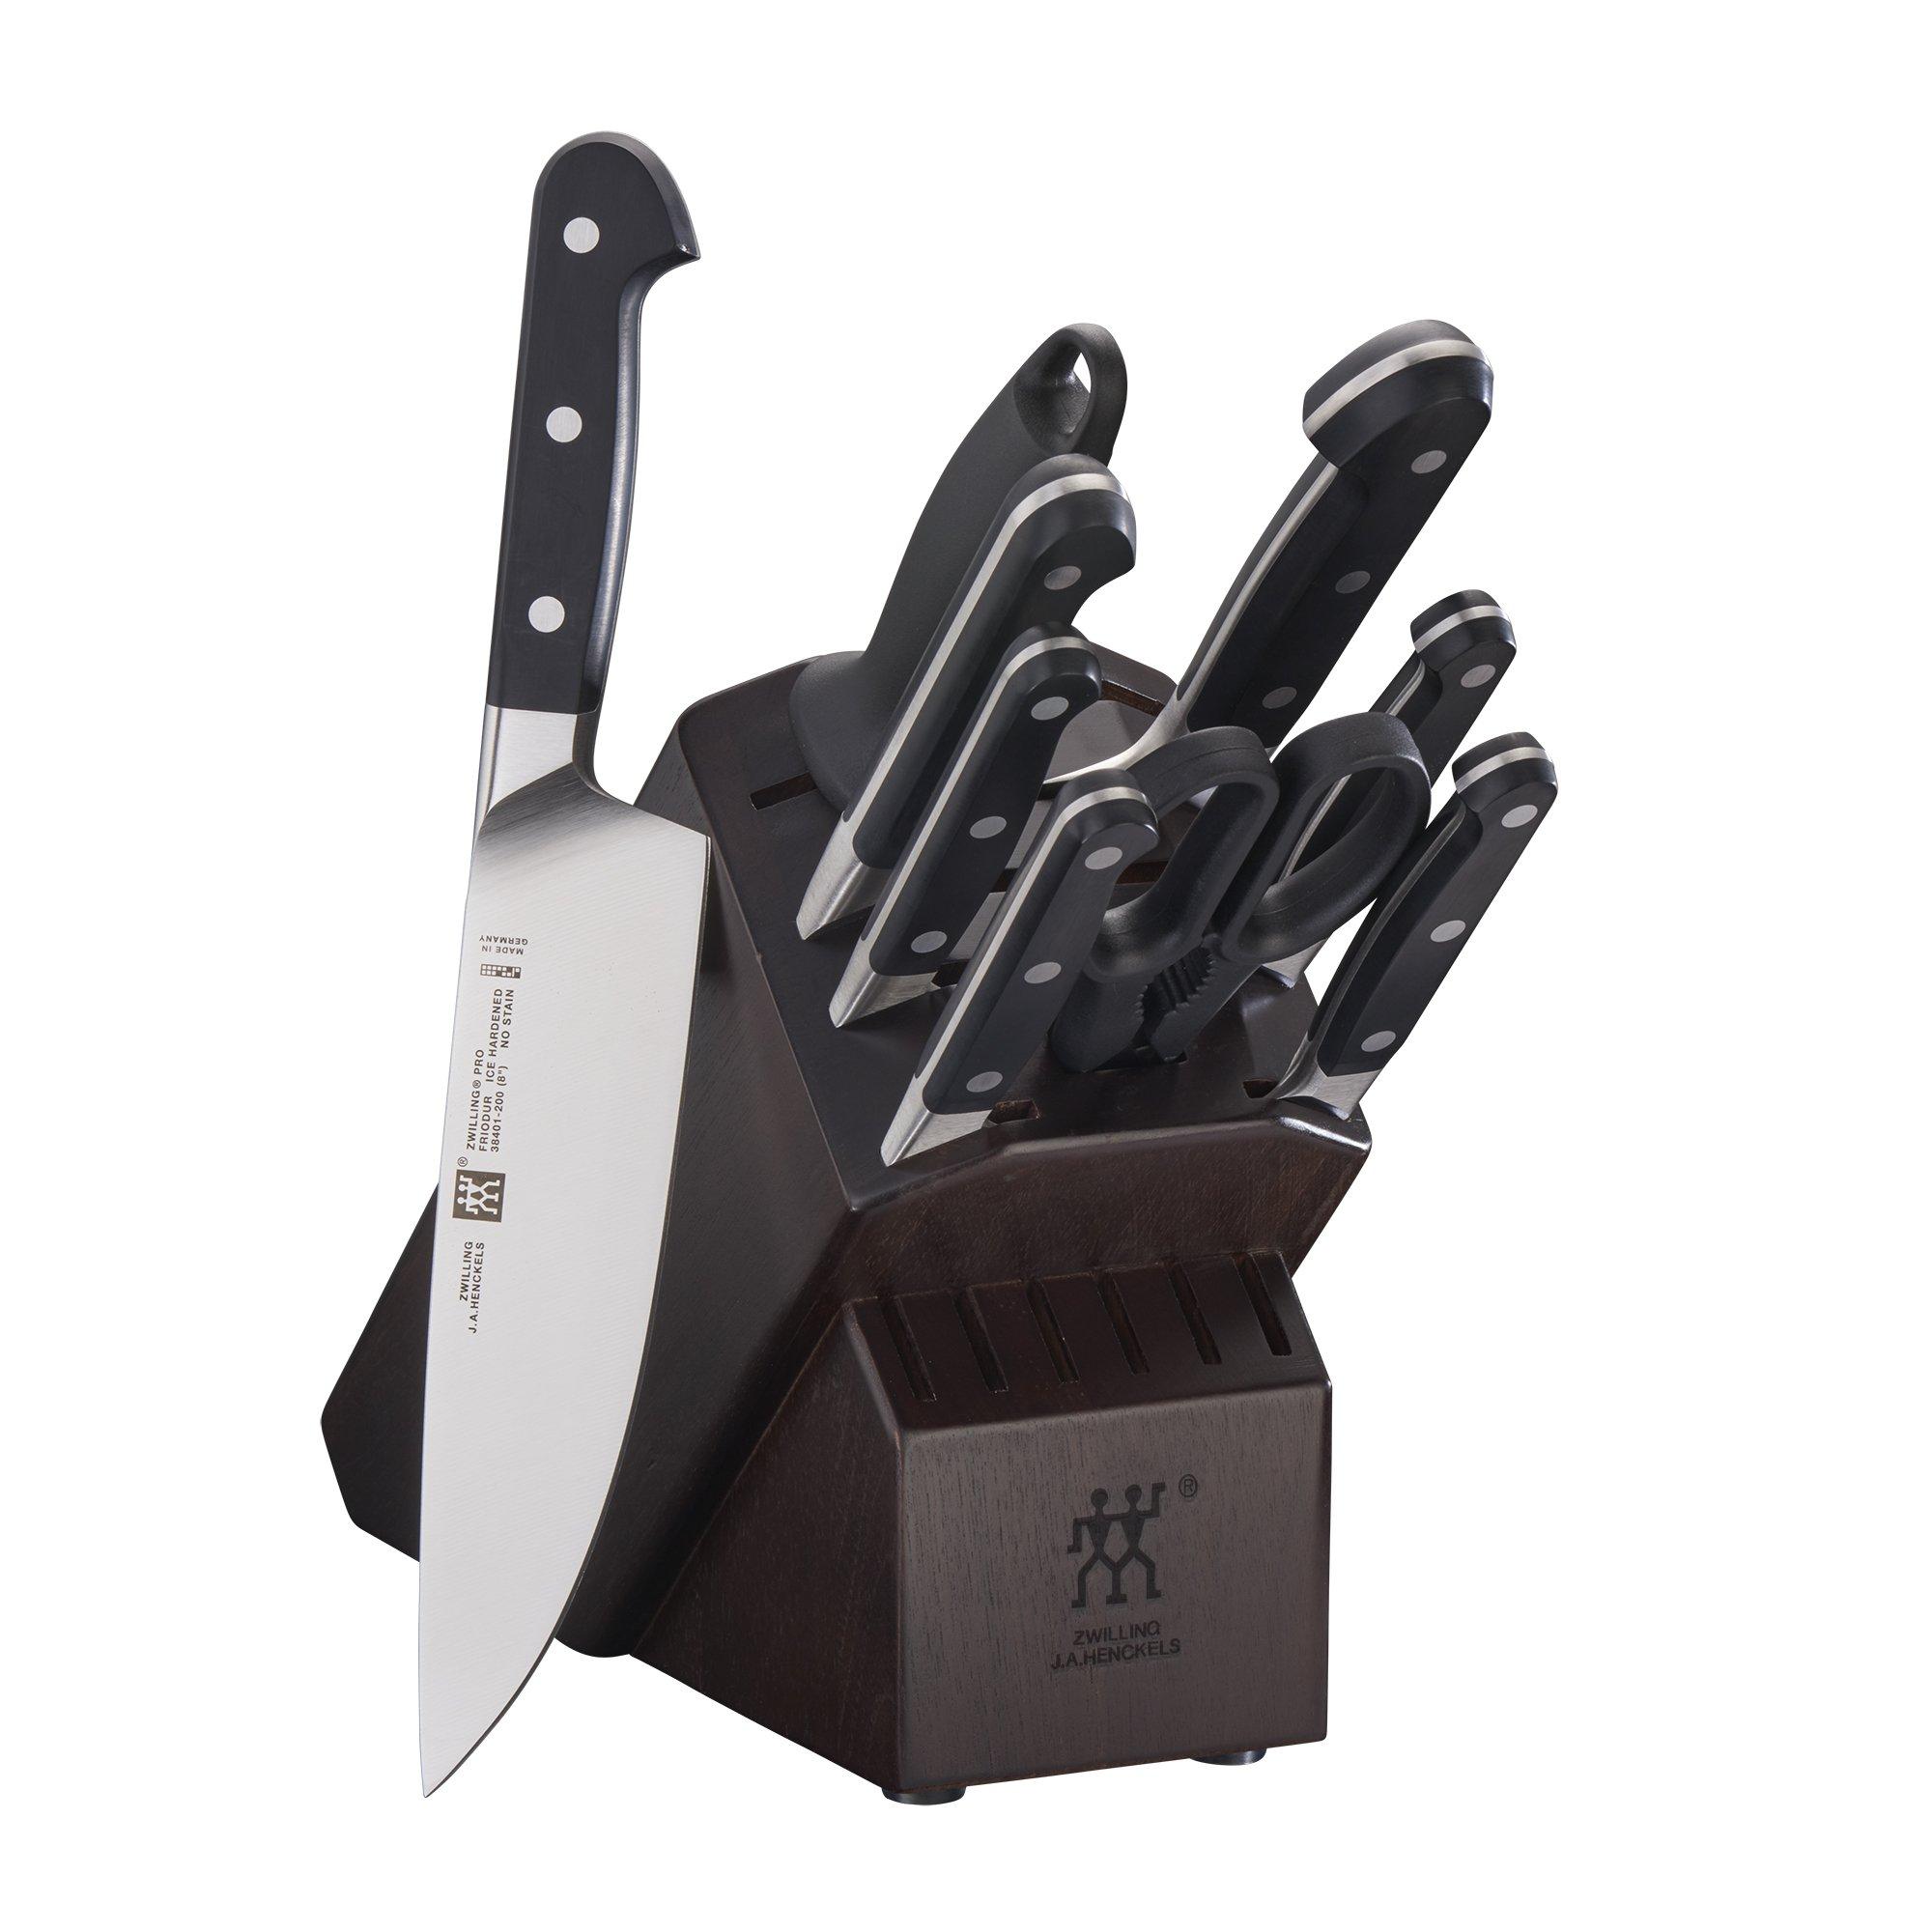 ZWILLING Pro 10-pc Knife Block Set - Walnut by ZWILLING J.A. Henckels (Image #1)